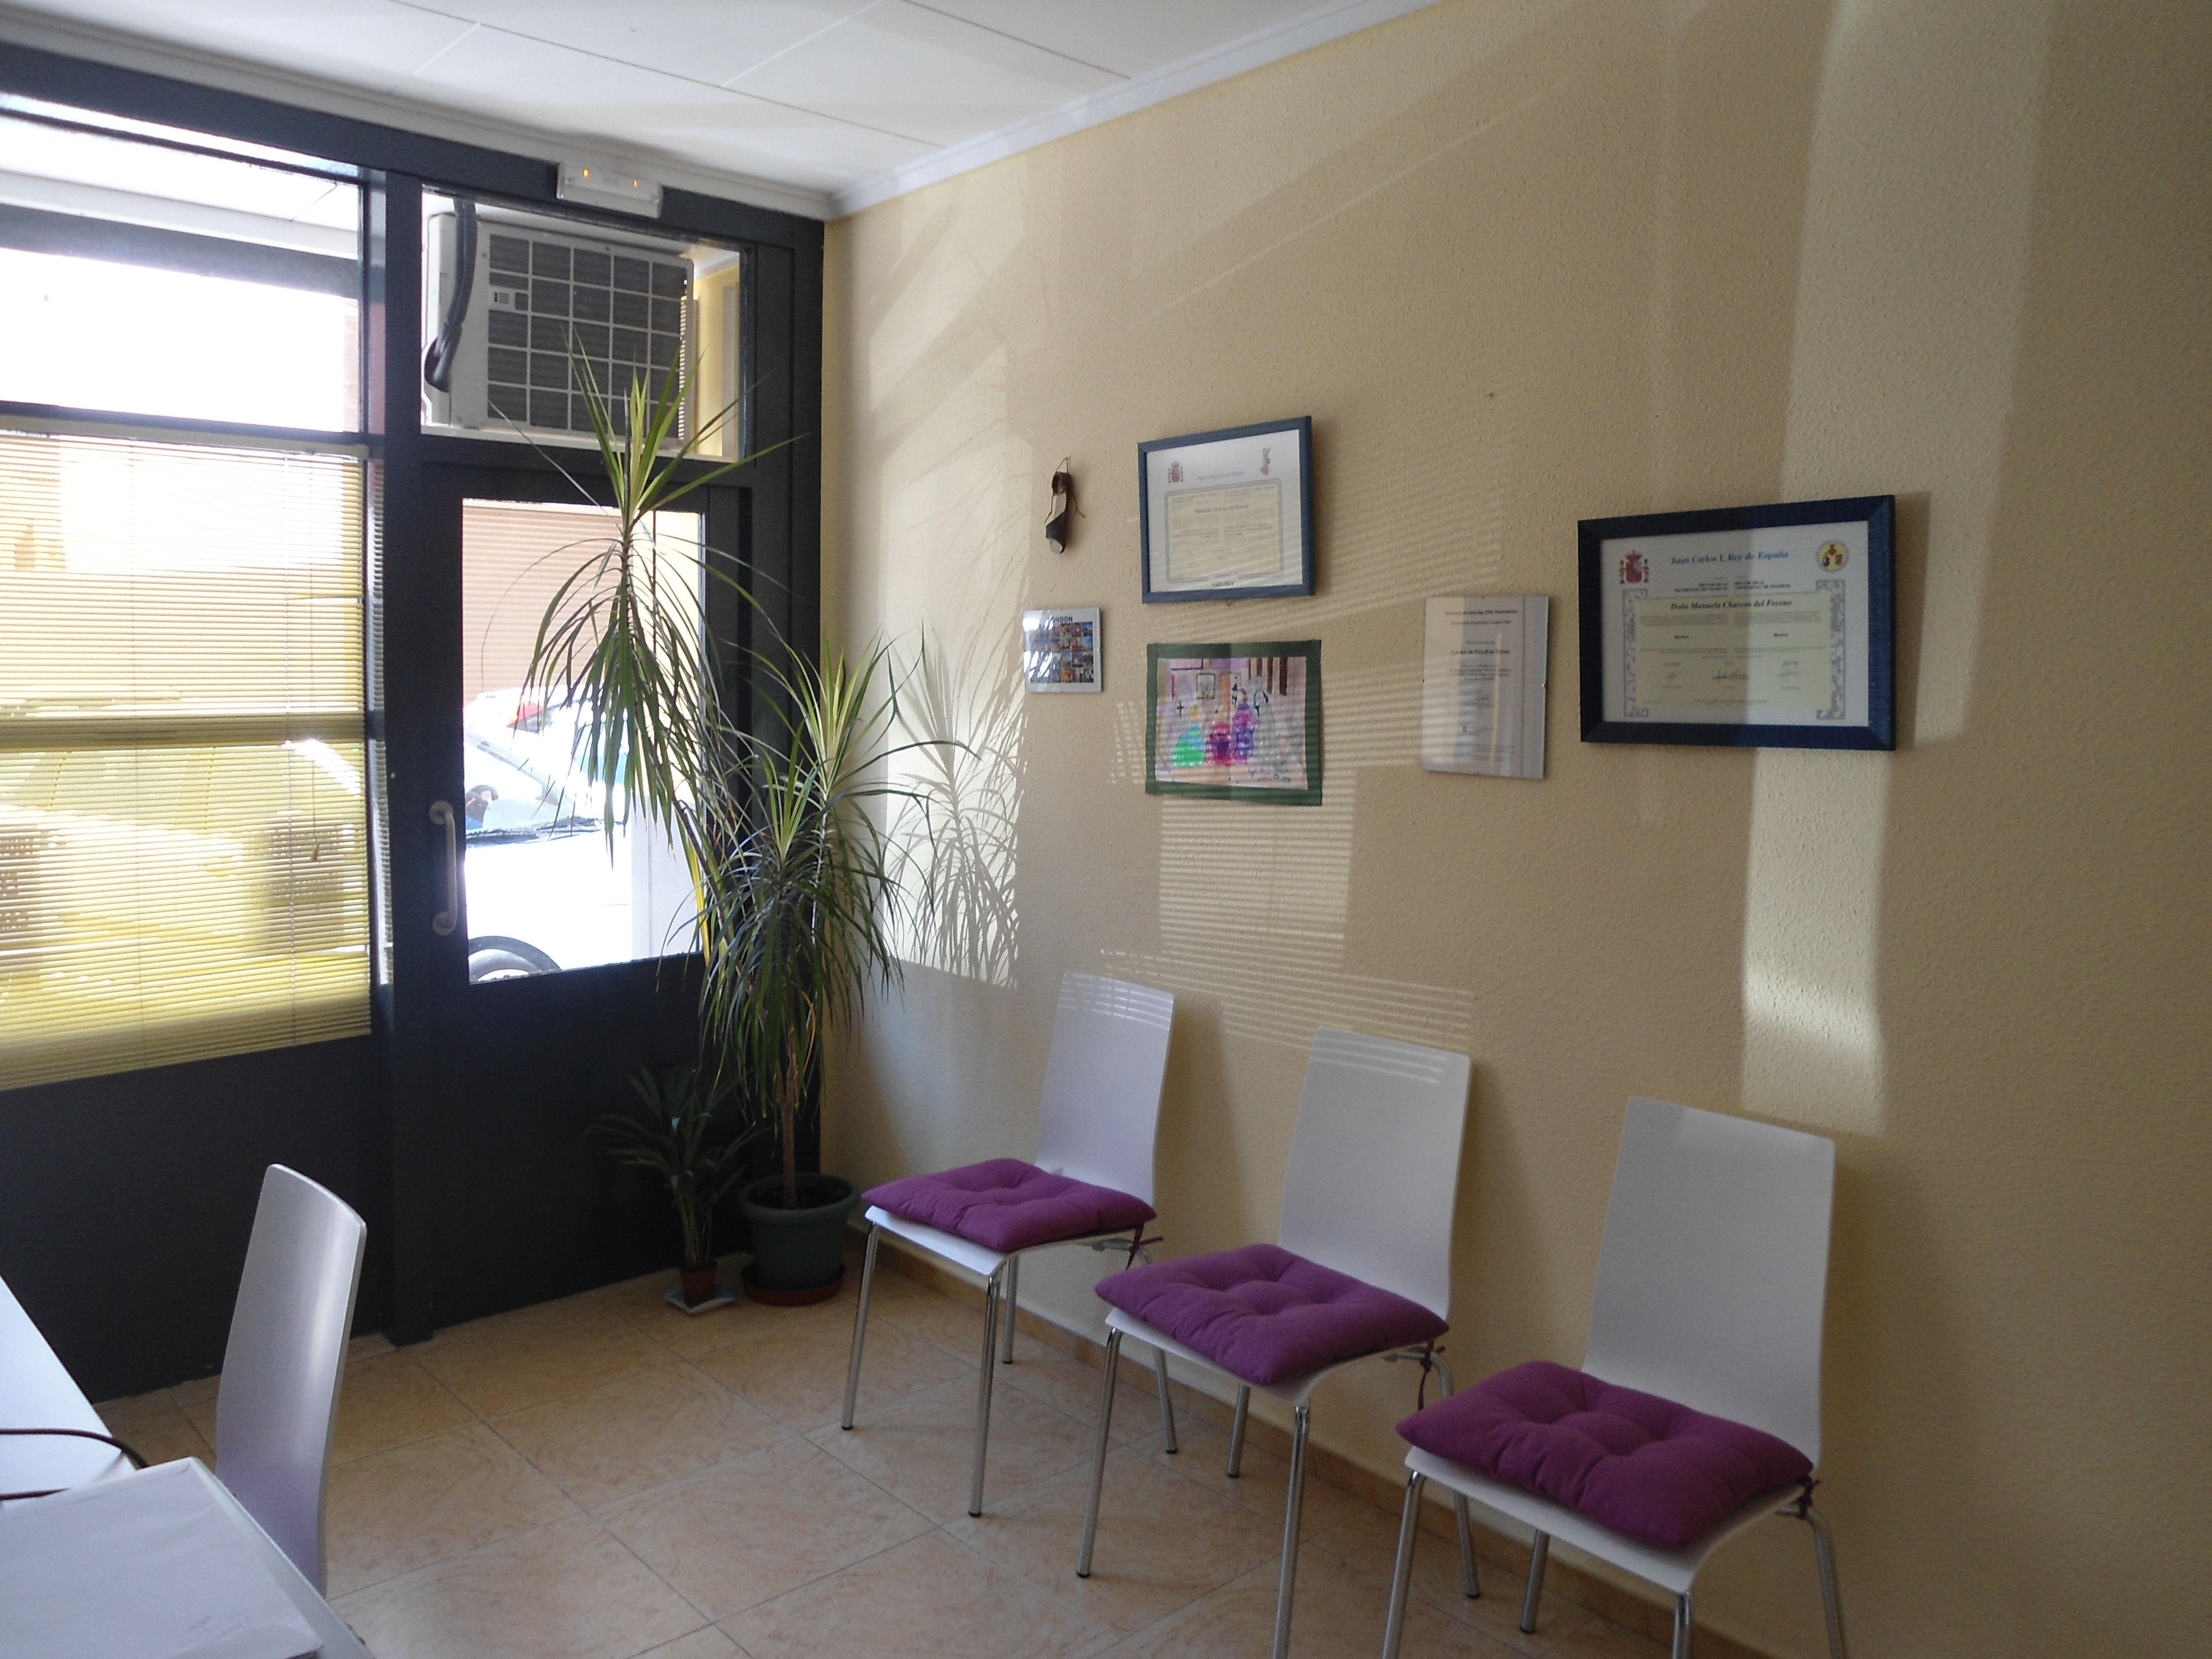 Foto 15 de Academias de idiomas en Moncada | Centre d'Estudis Etnies